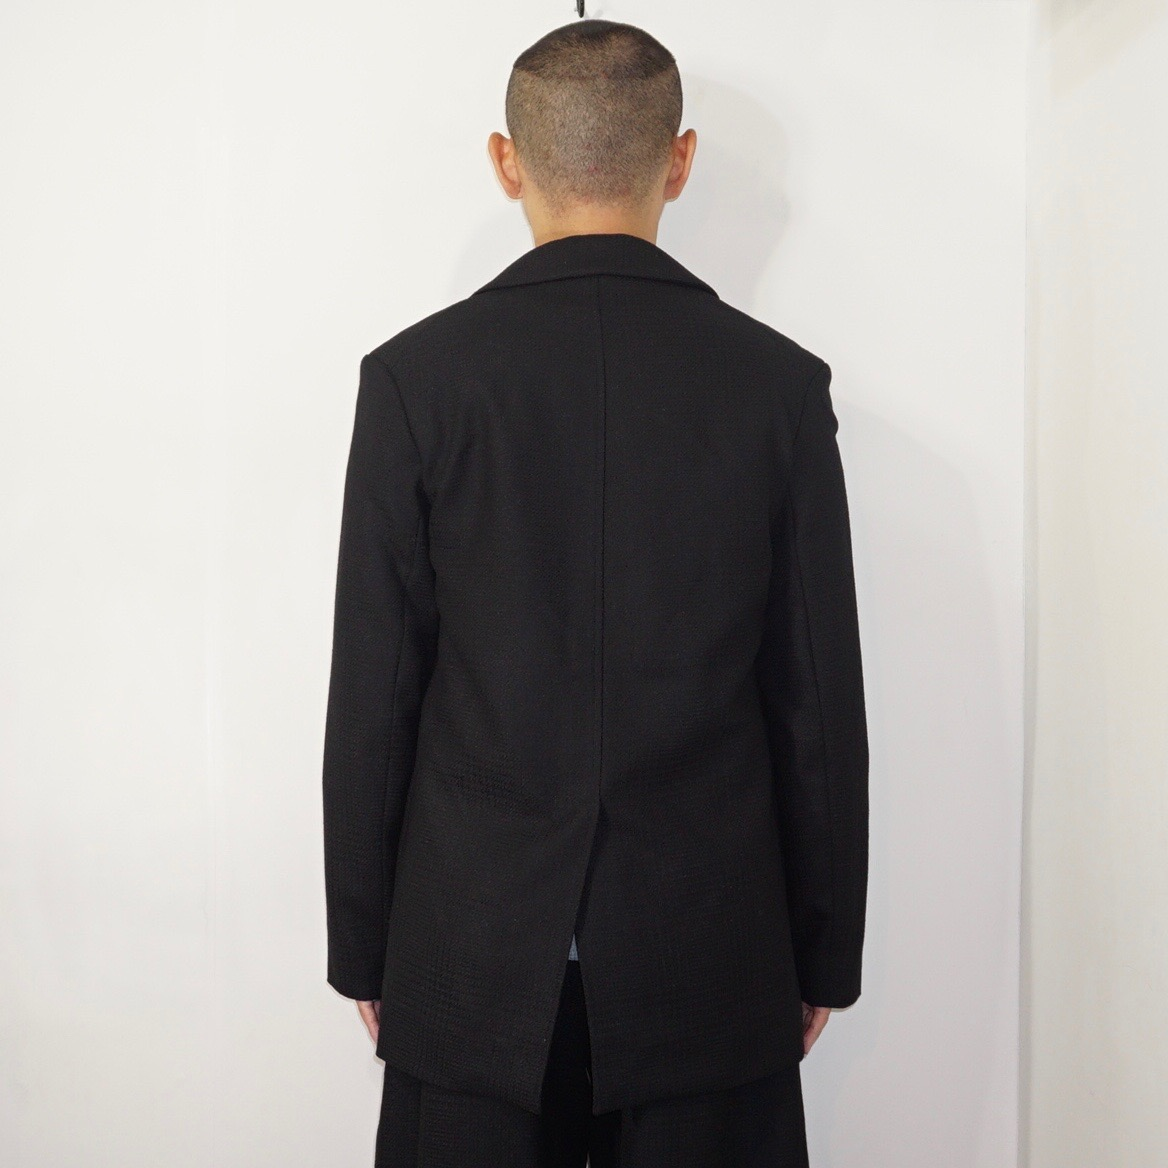 STUDIO NICHOLSON(スタジオニコルソン) | ZHANG / GHOST BLACKWATCH BLUFF POCKET WOOL JACKET(ゴーストブラックウオッチ ウールジャケット ) − BLACK